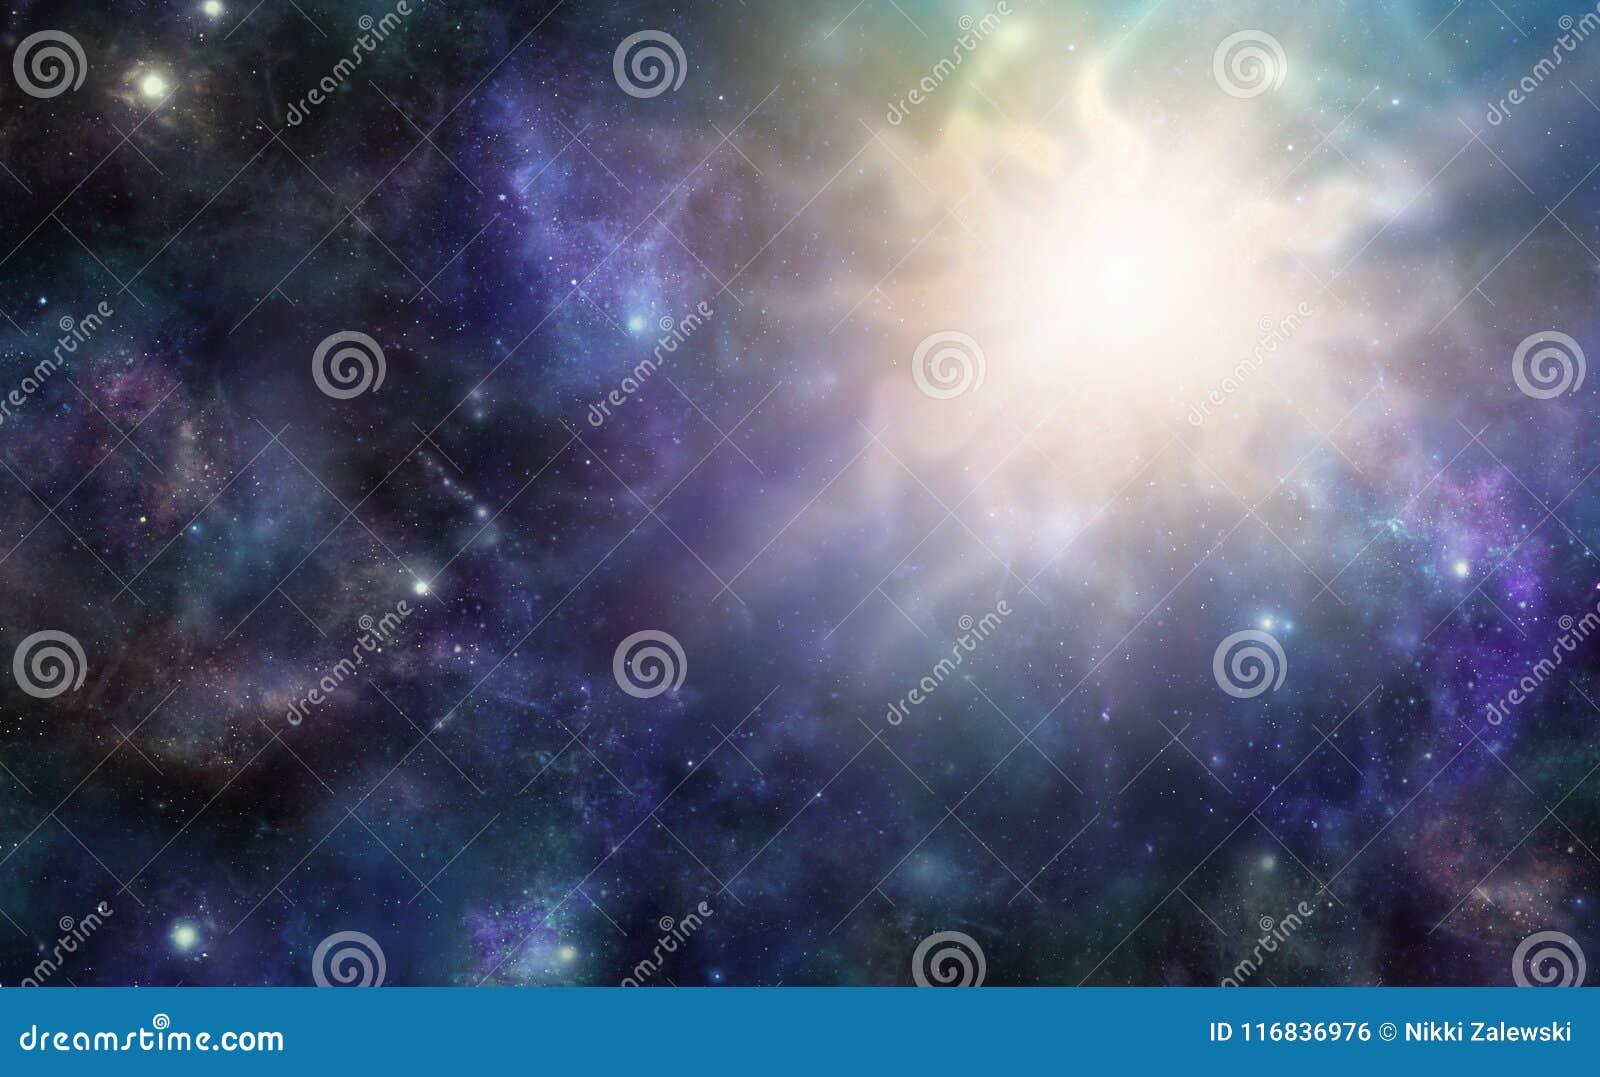 Deep Space Massive Cosmic Event